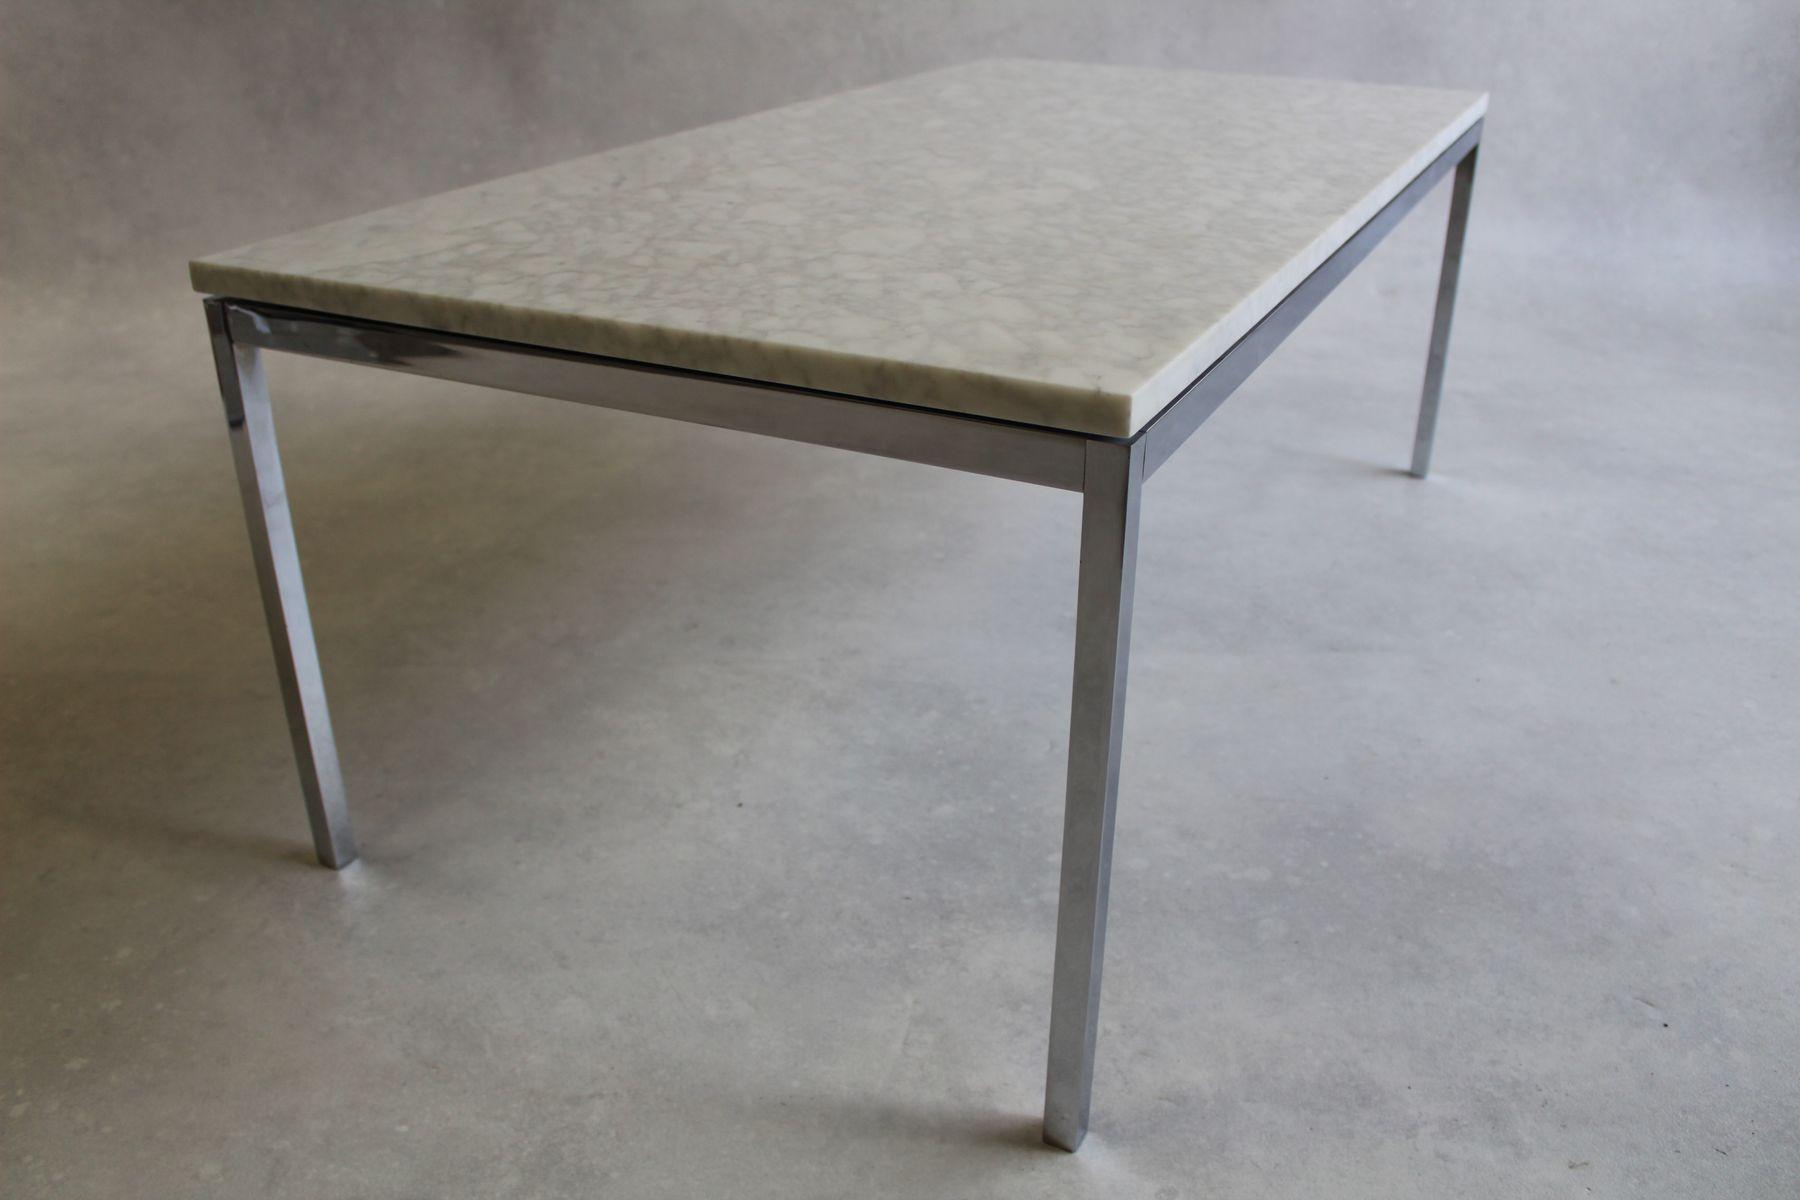 table basse vintage en marbre et chrome par florence knoll bassett pour knoll international en. Black Bedroom Furniture Sets. Home Design Ideas